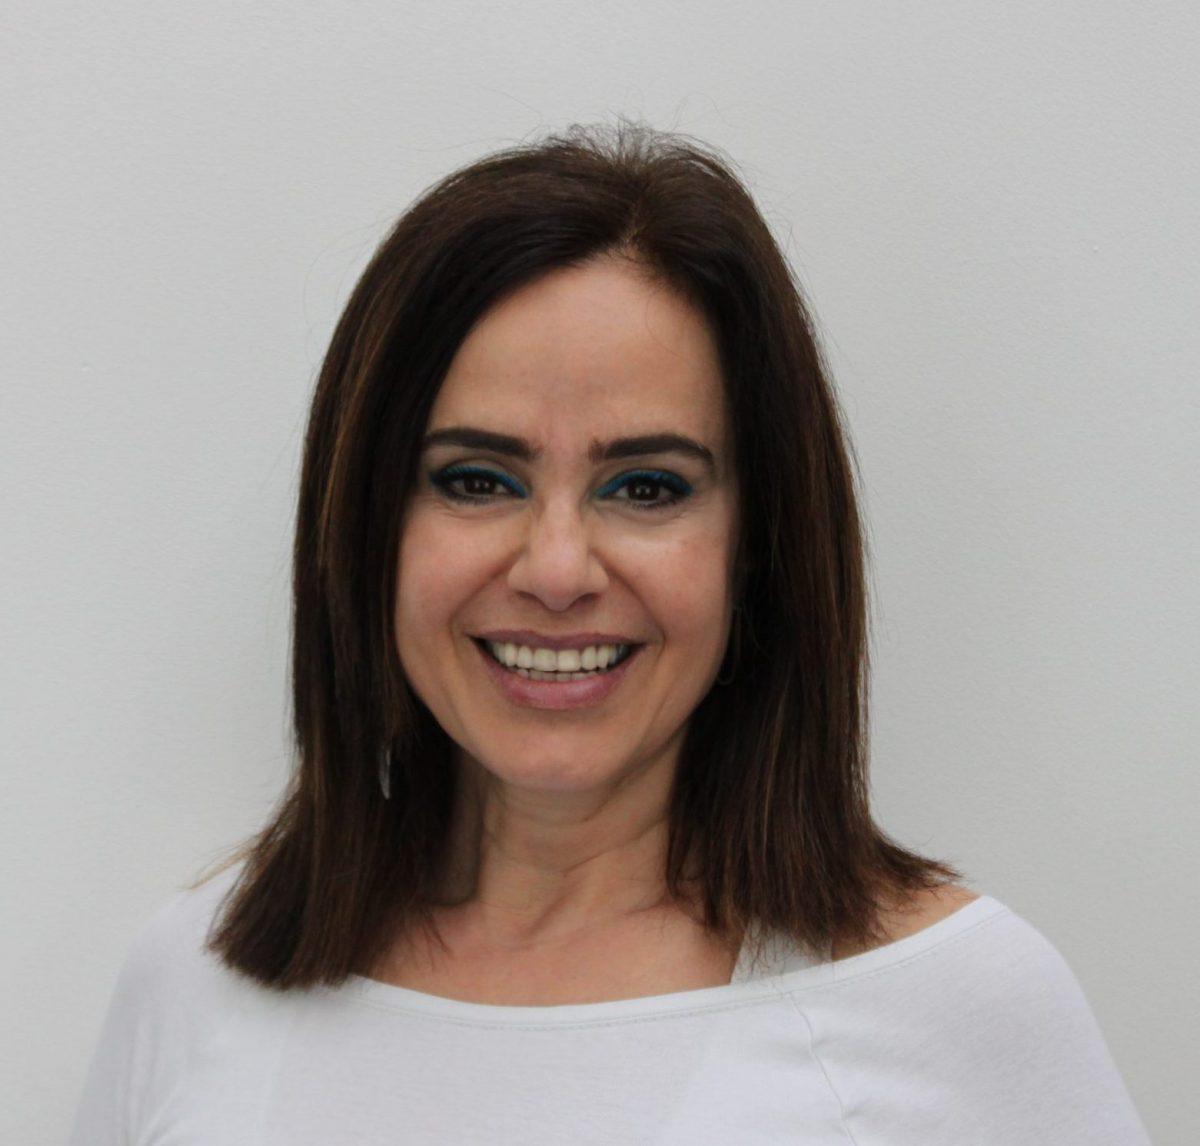 Headshot of Maya Administrator at Johnsons Chartered Accountants